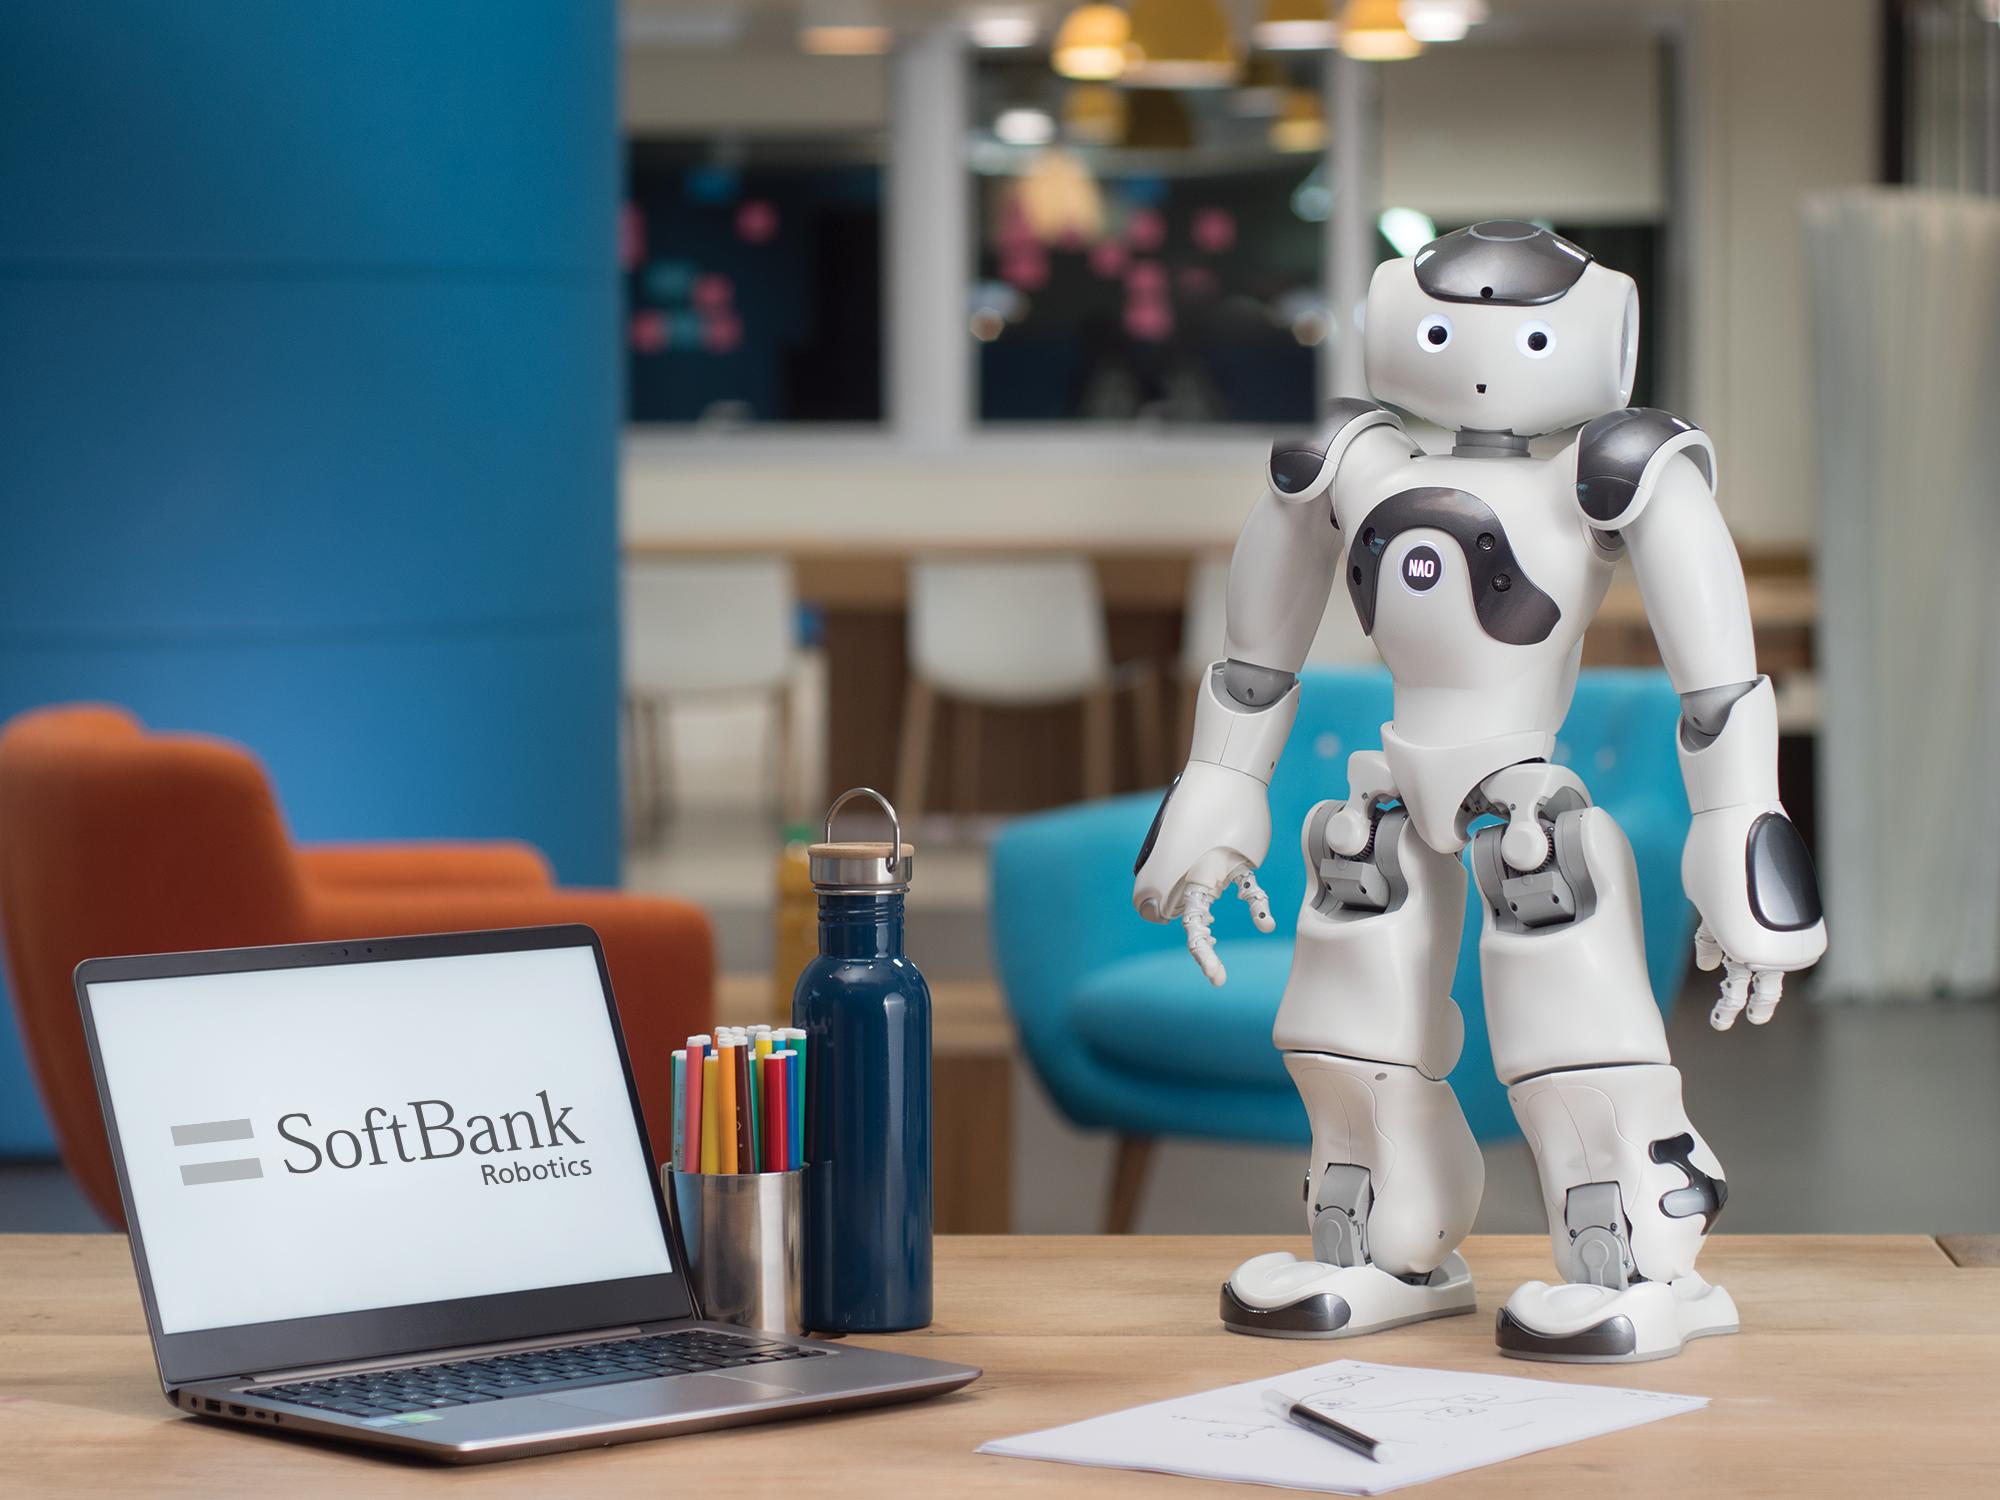 nao-softbank-robotics_ld